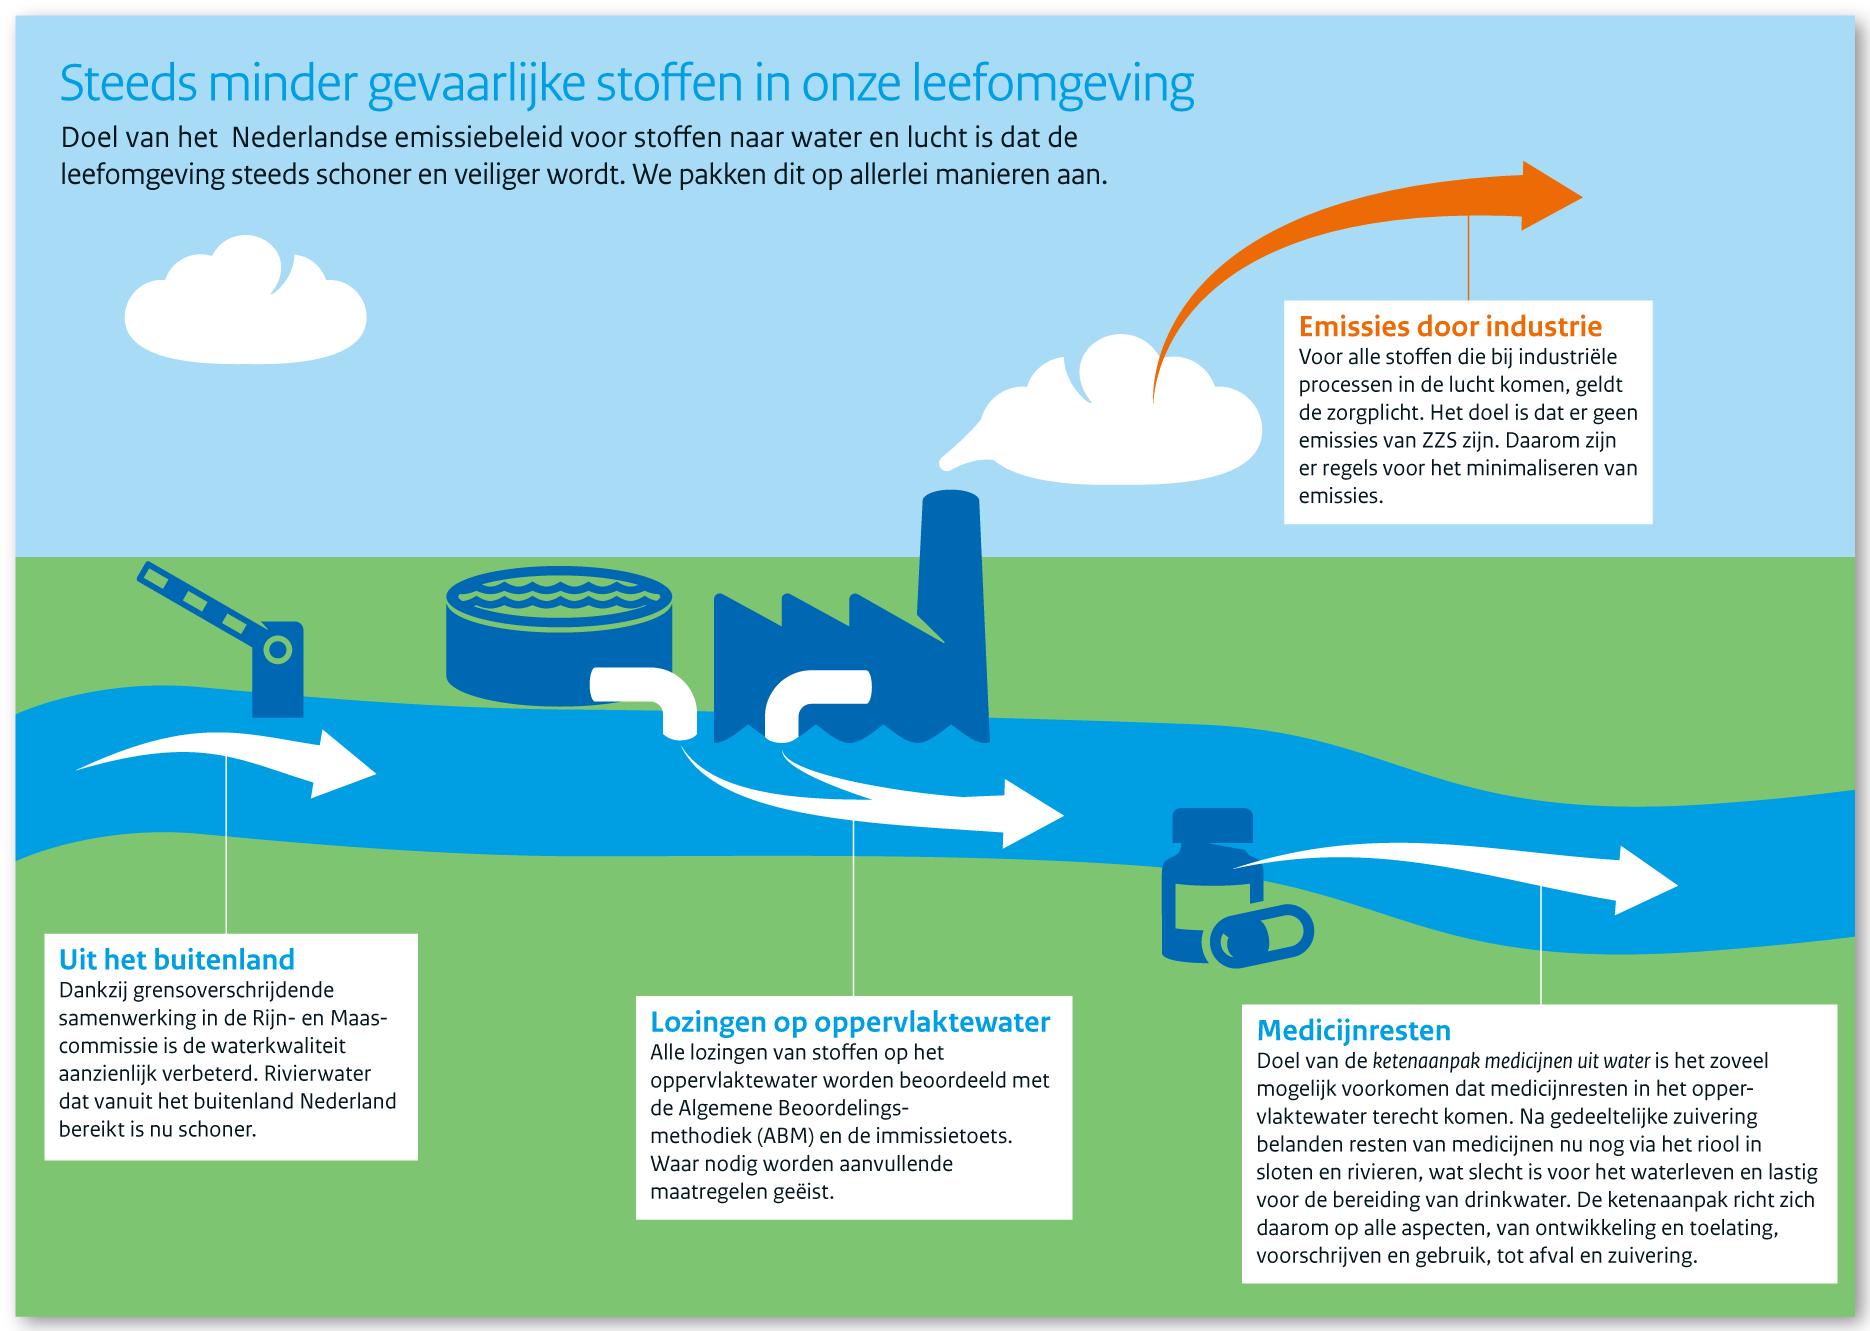 Folder Emissiebeleid (Ministerie van IenW)